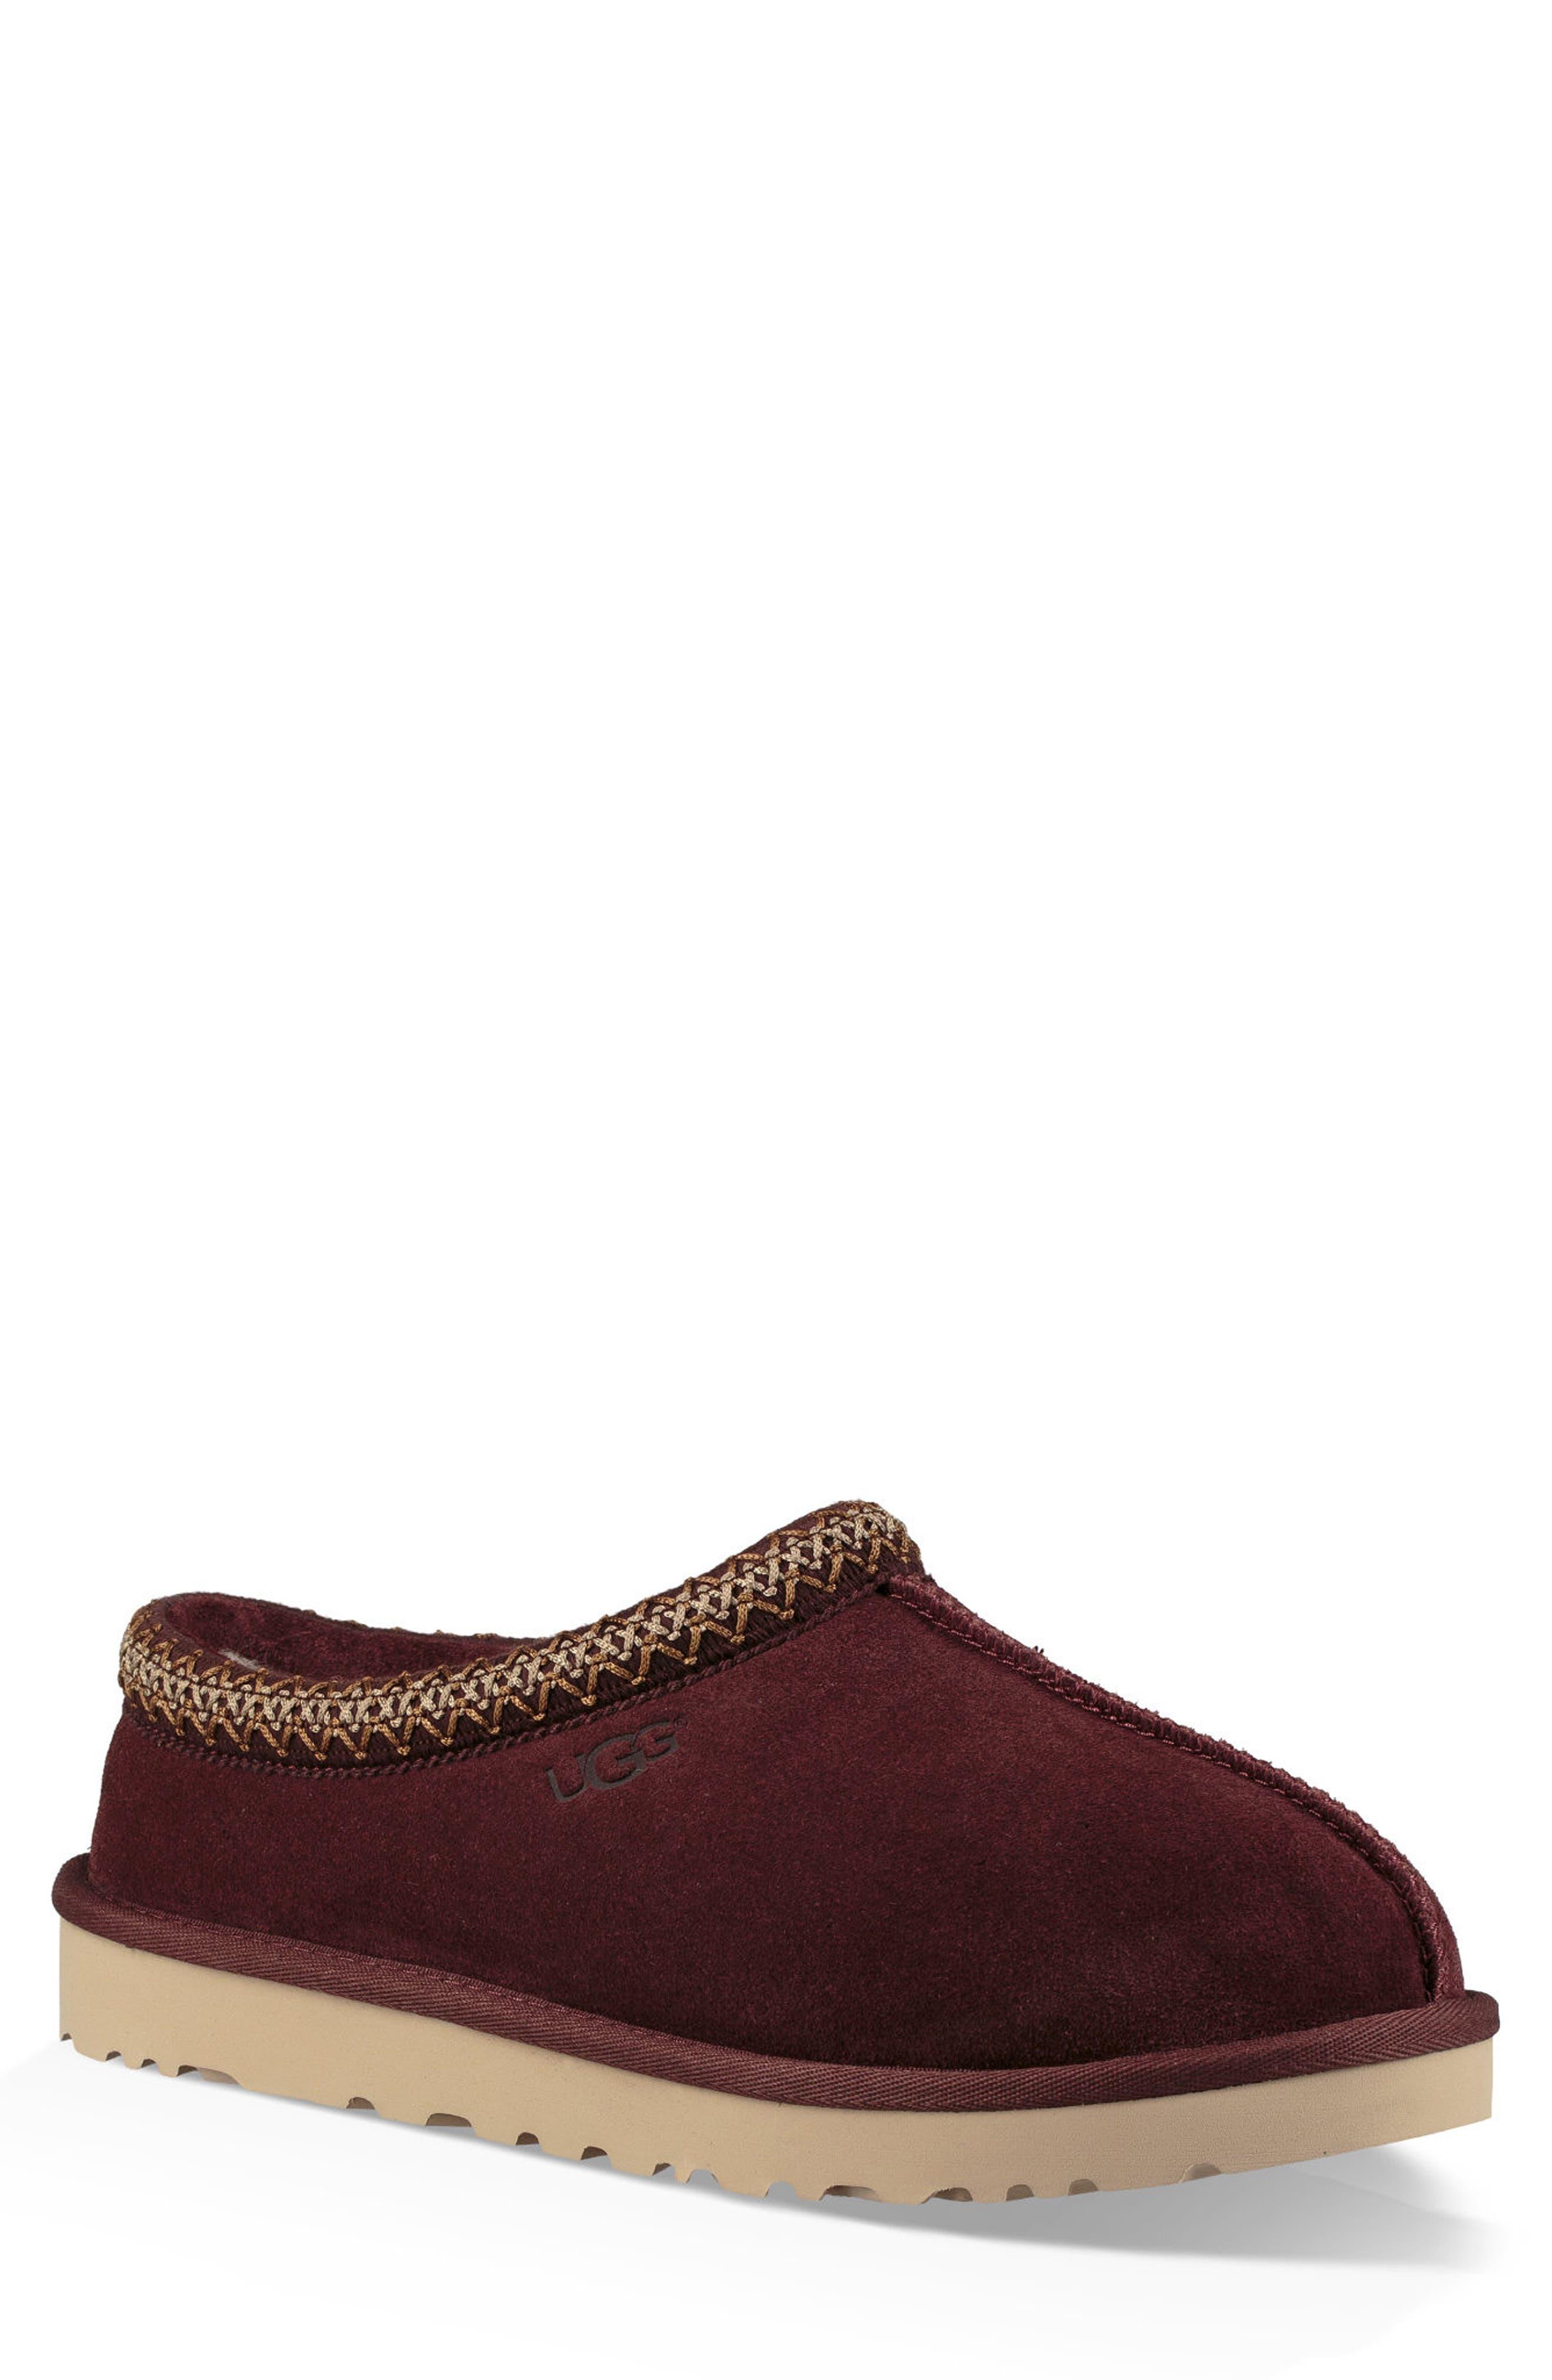 'Tasman' Slipper, Main, color, BURGUNDY